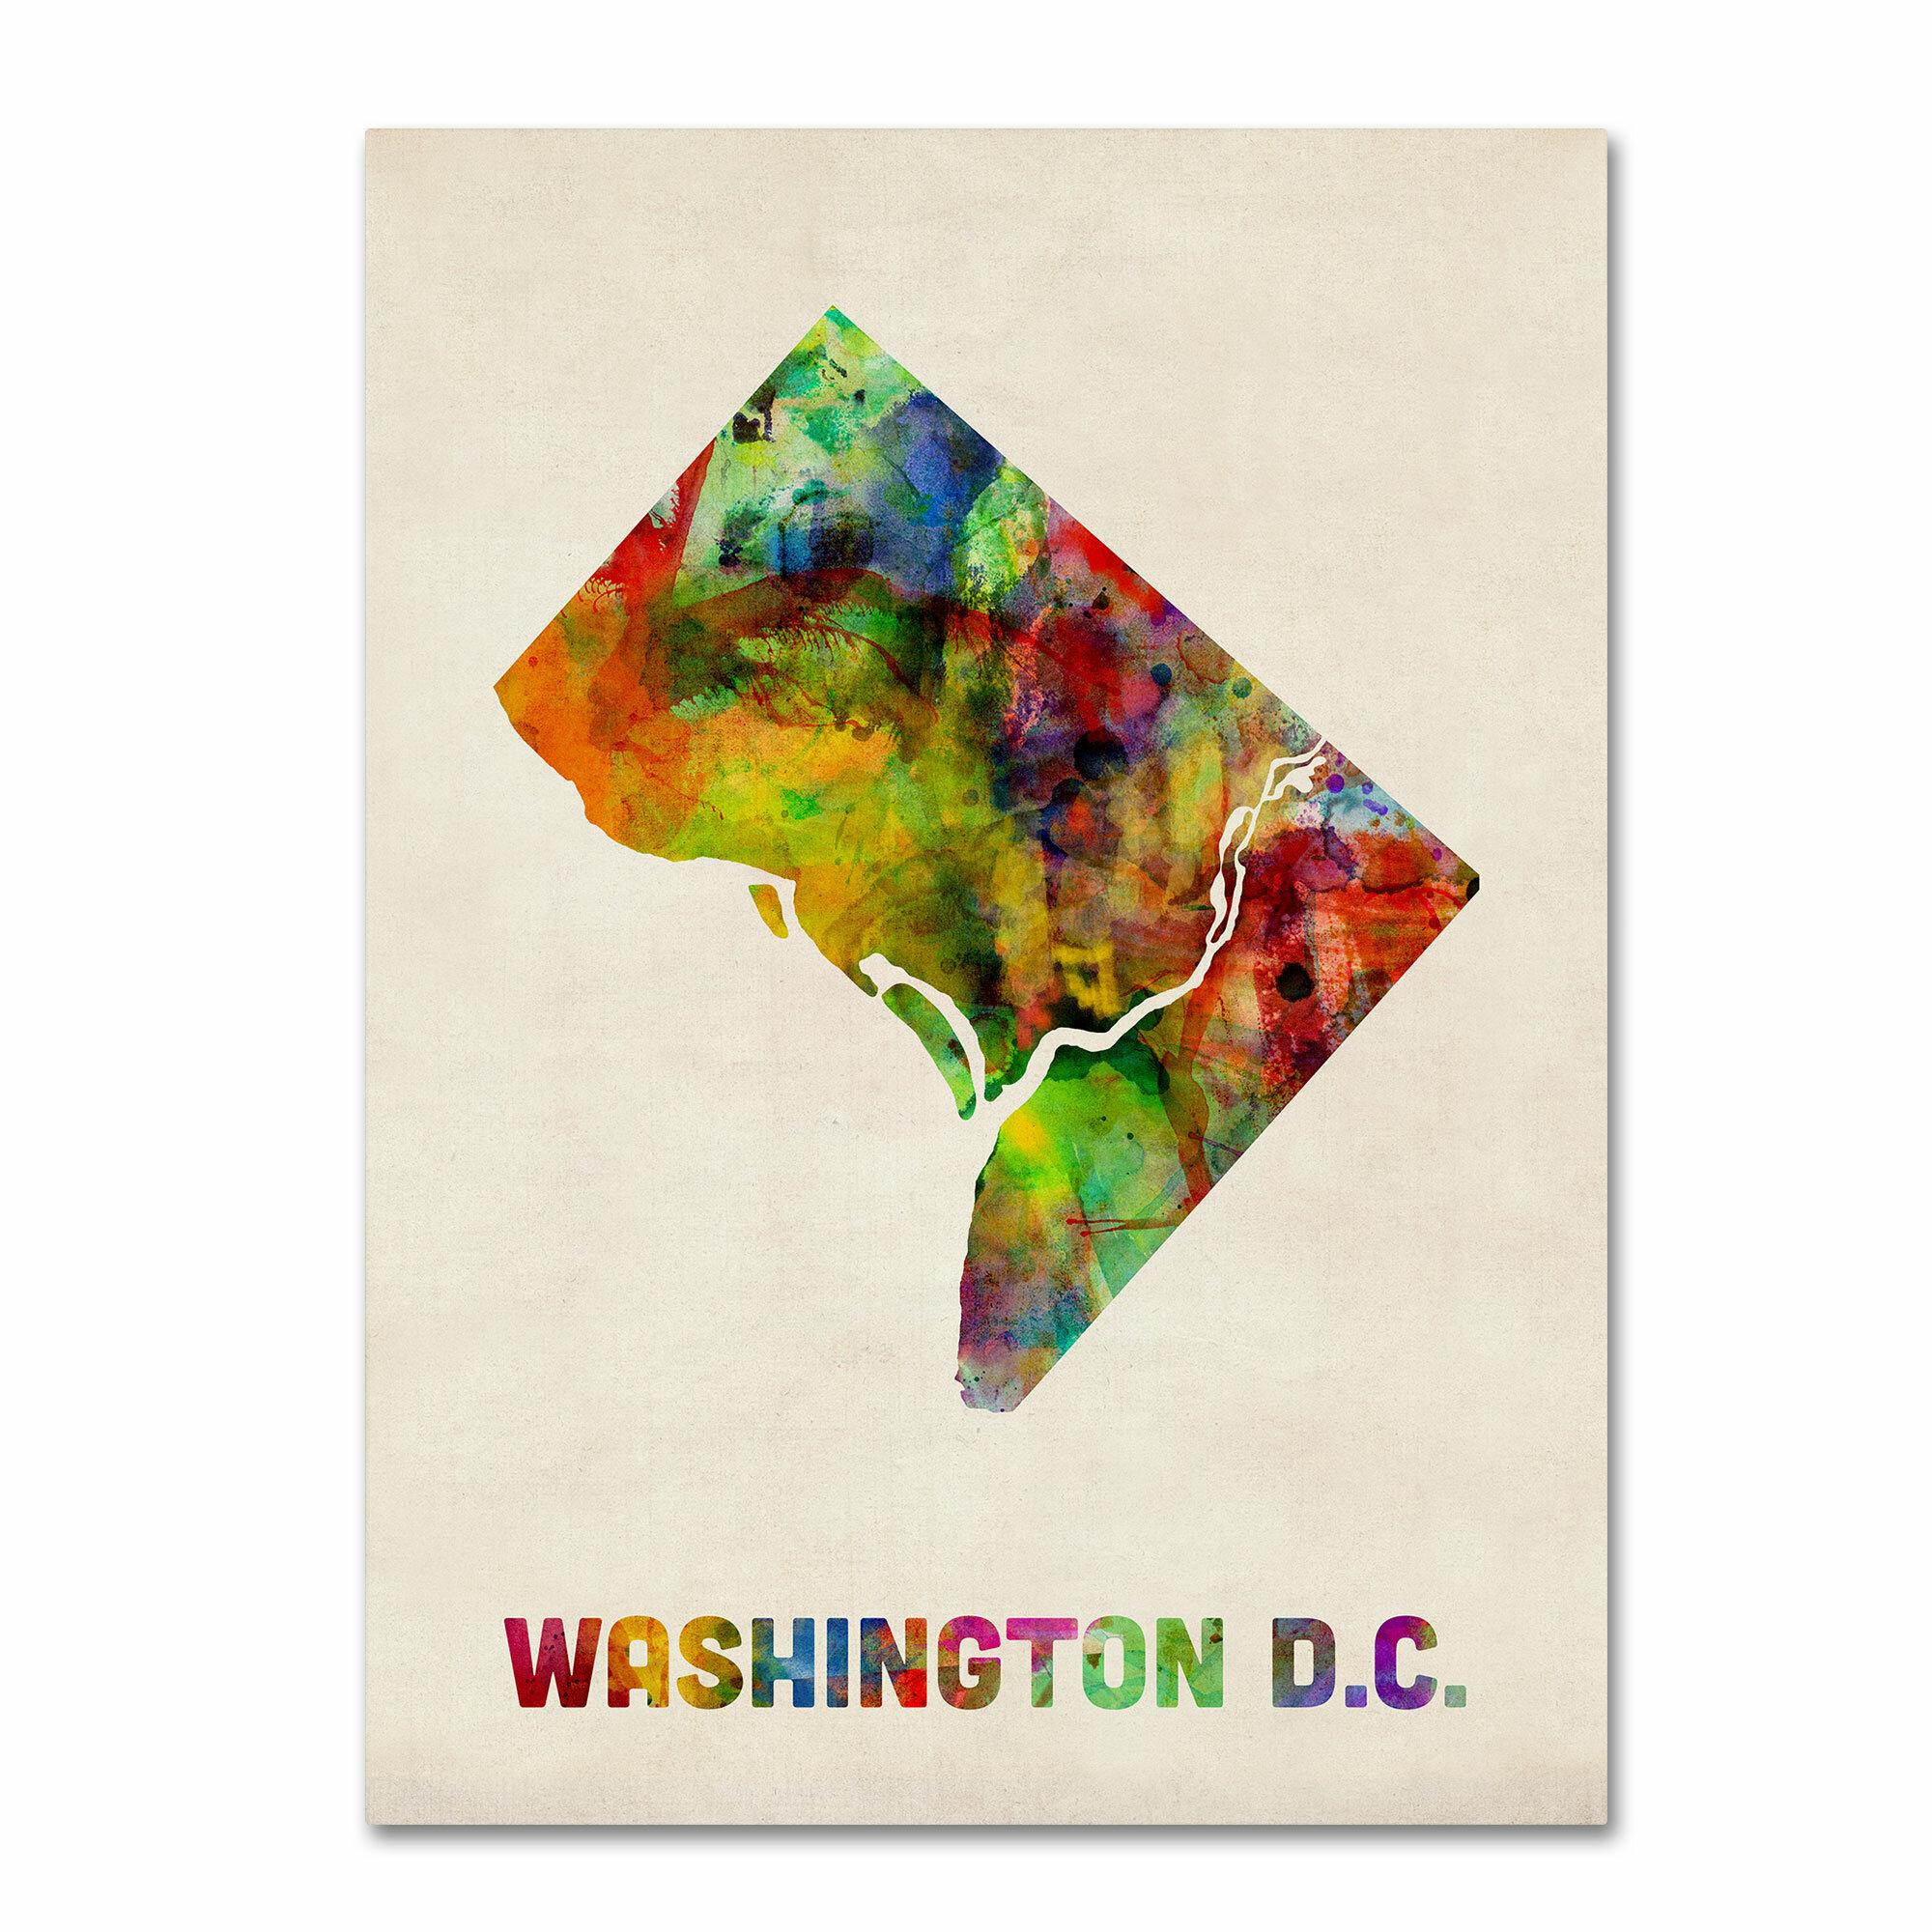 Trademark Art Washington D C Map By Michael Tompsett Framed Graphic Art On Wrapped Canvas Wayfair